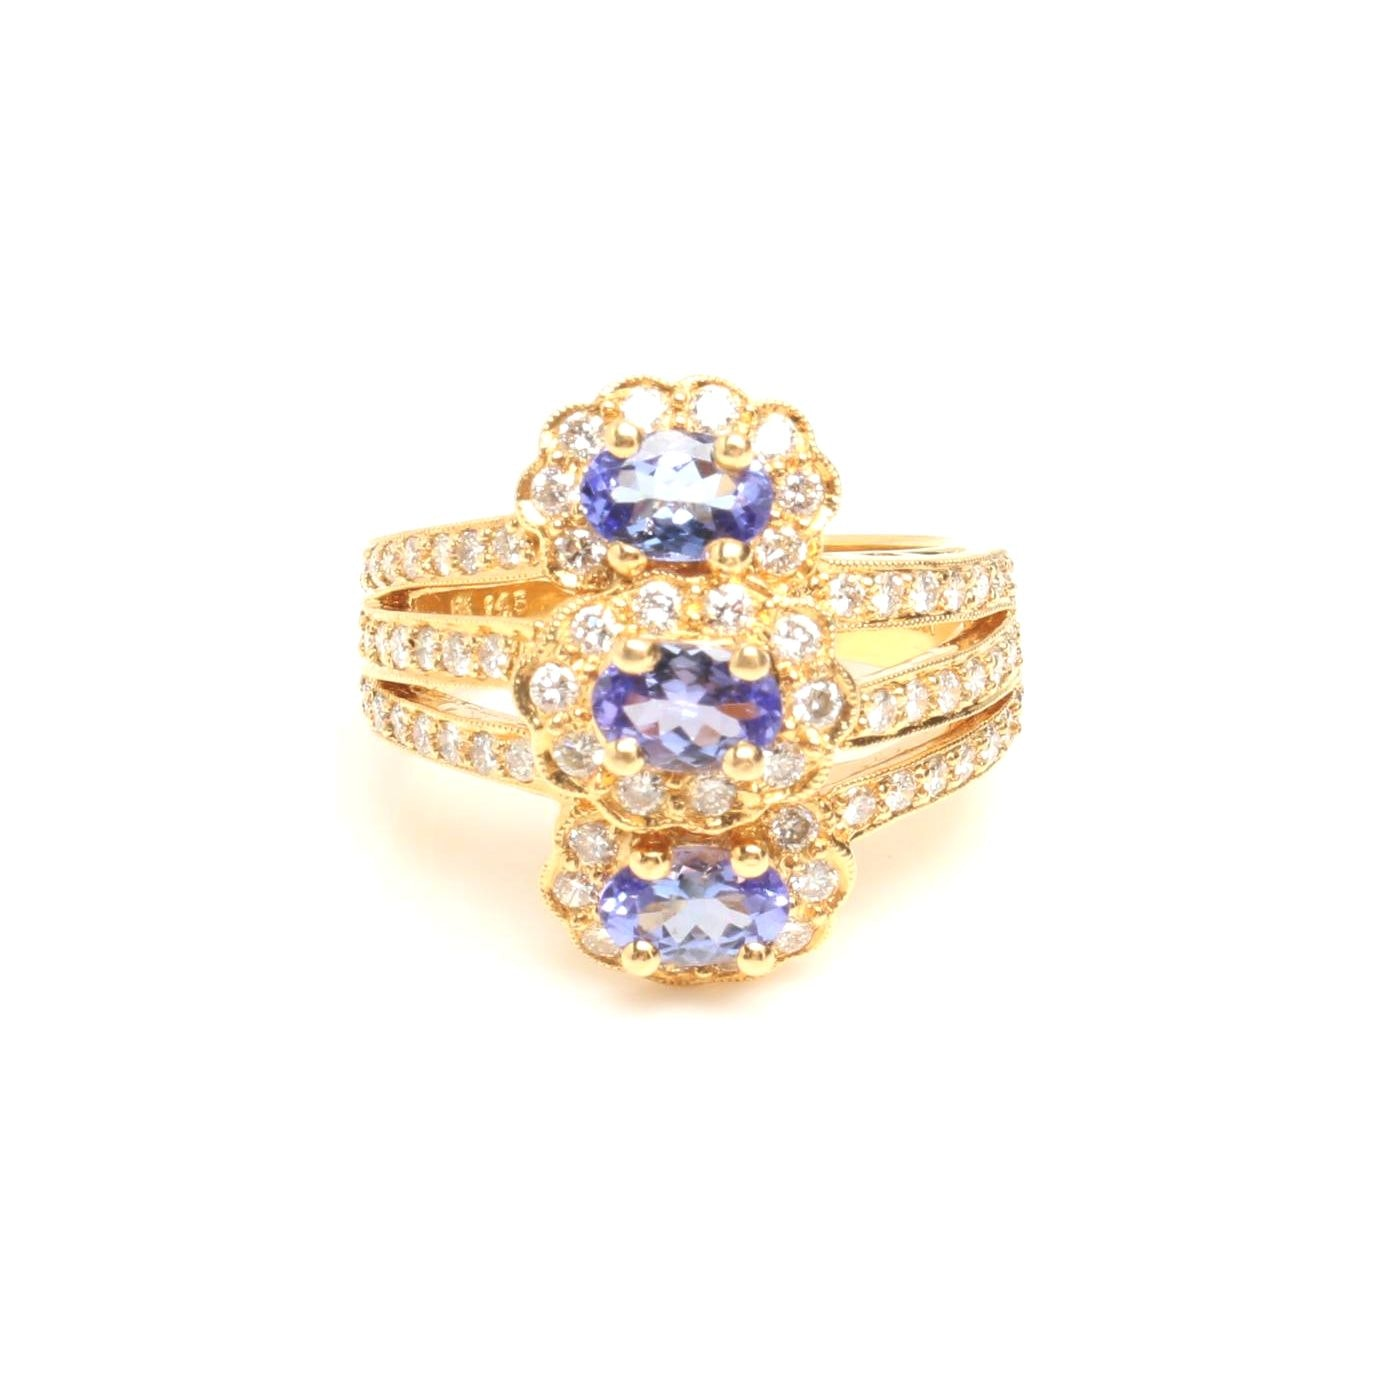 18K Yellow Gold Tanzanite and 1.02 CTW Diamond Ring